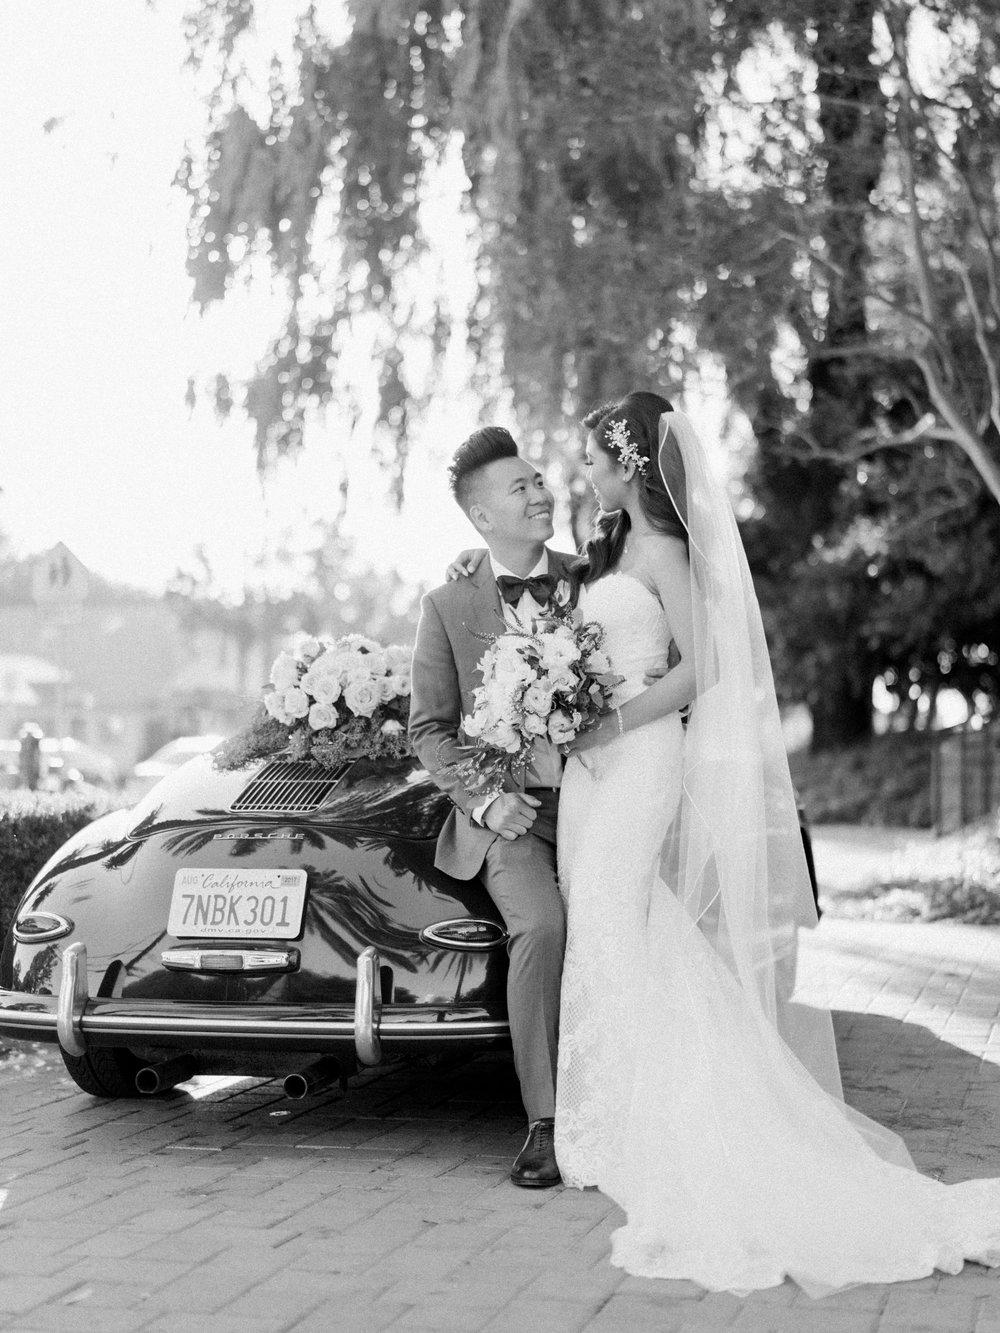 ChristineDomJonCu-Film-Wedding-Photographer14.jpg